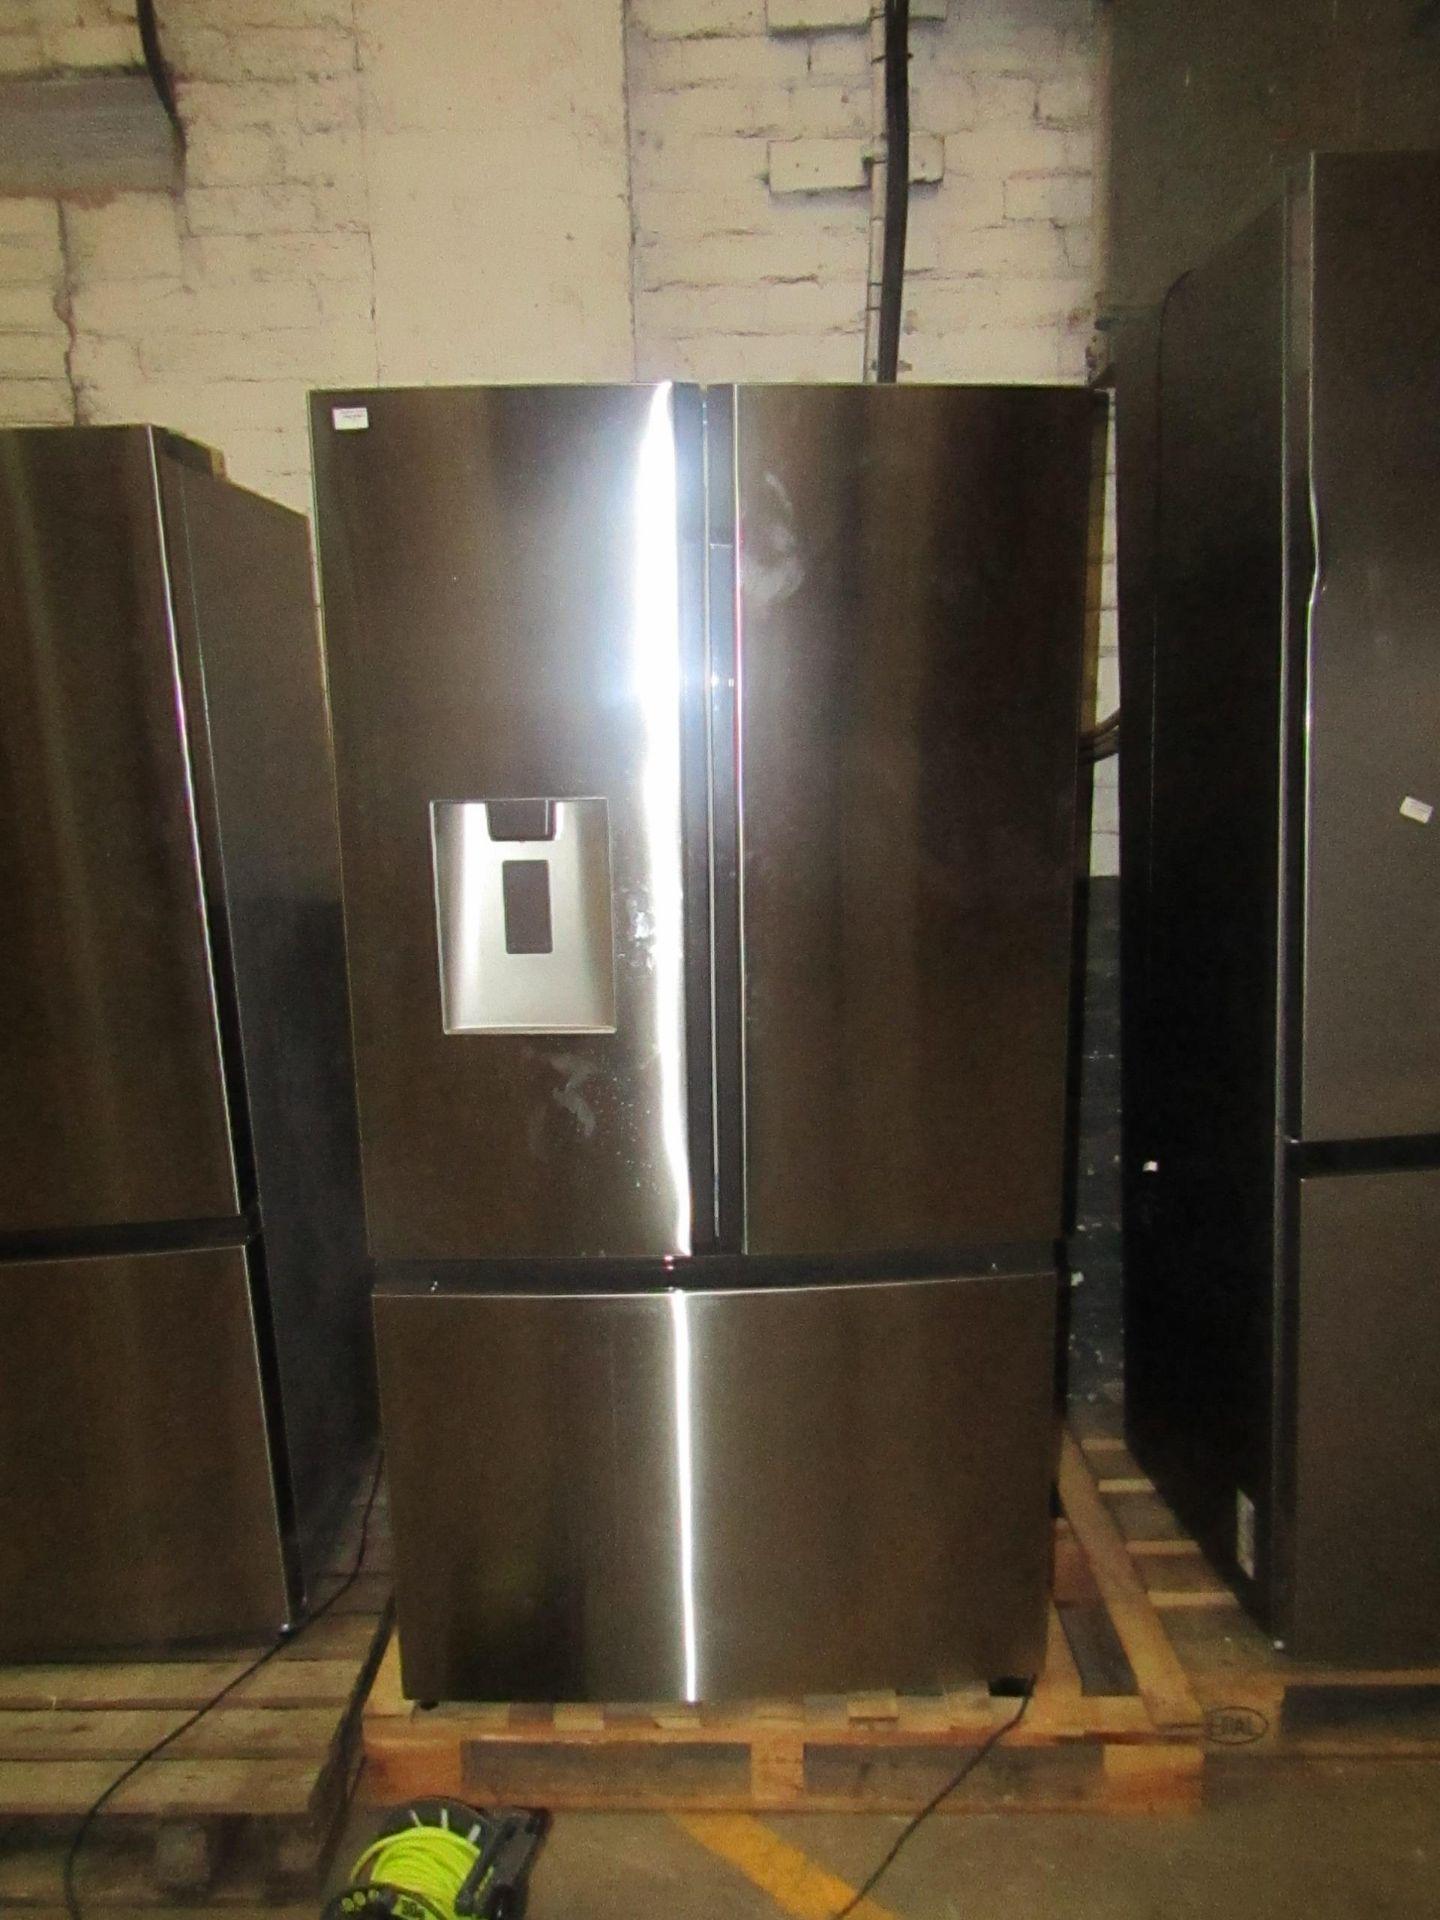 Hisense RF750N4ISF American fridge freezer, powers on but not getting cold.